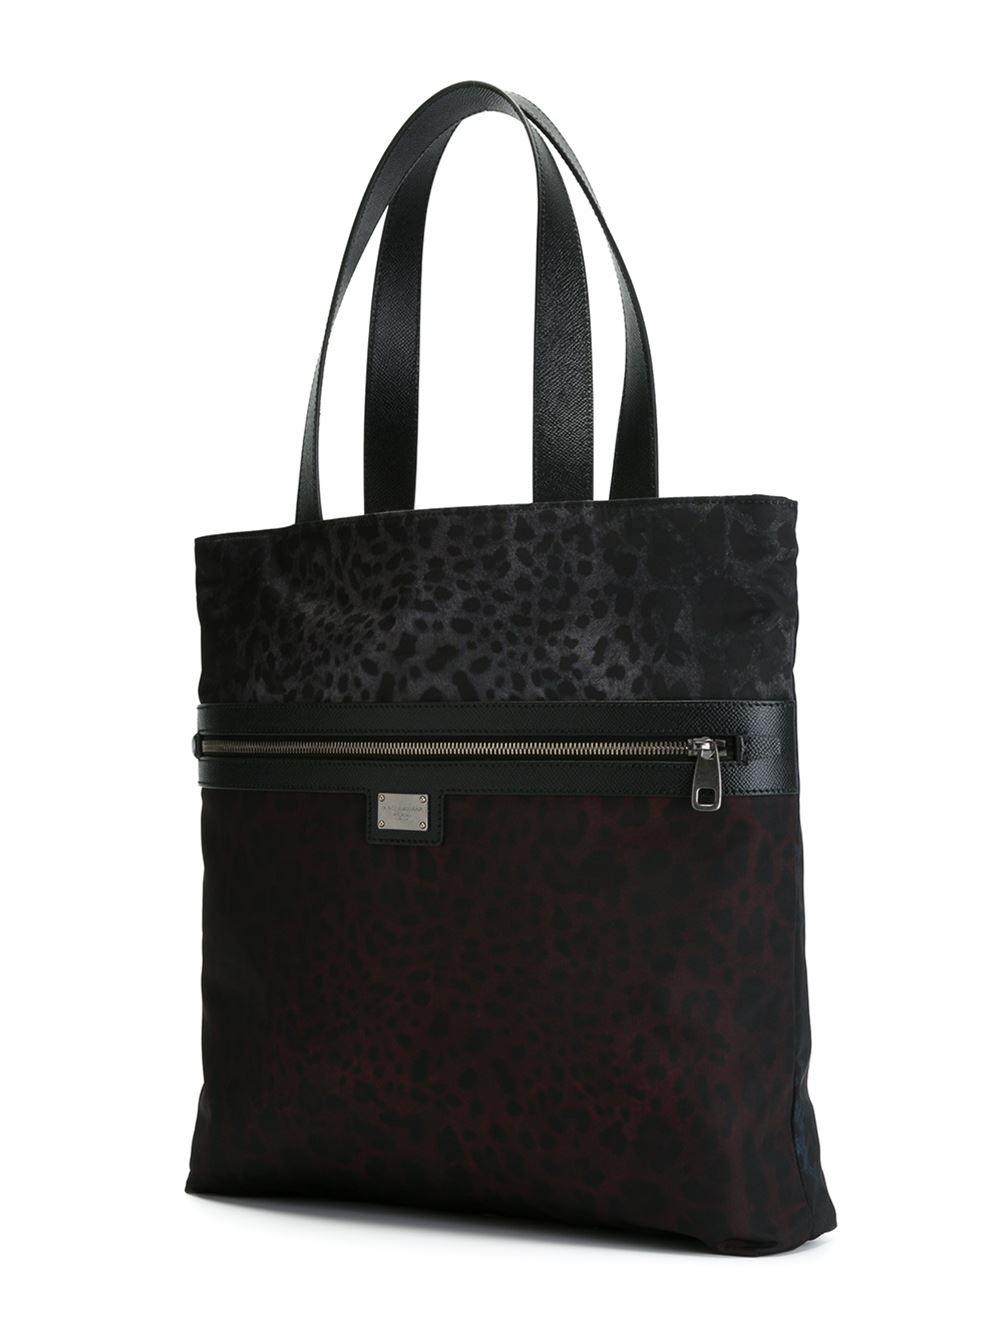 Dolce & Gabbana Leopard Print Reversible Shopper in Red (Black) for Men